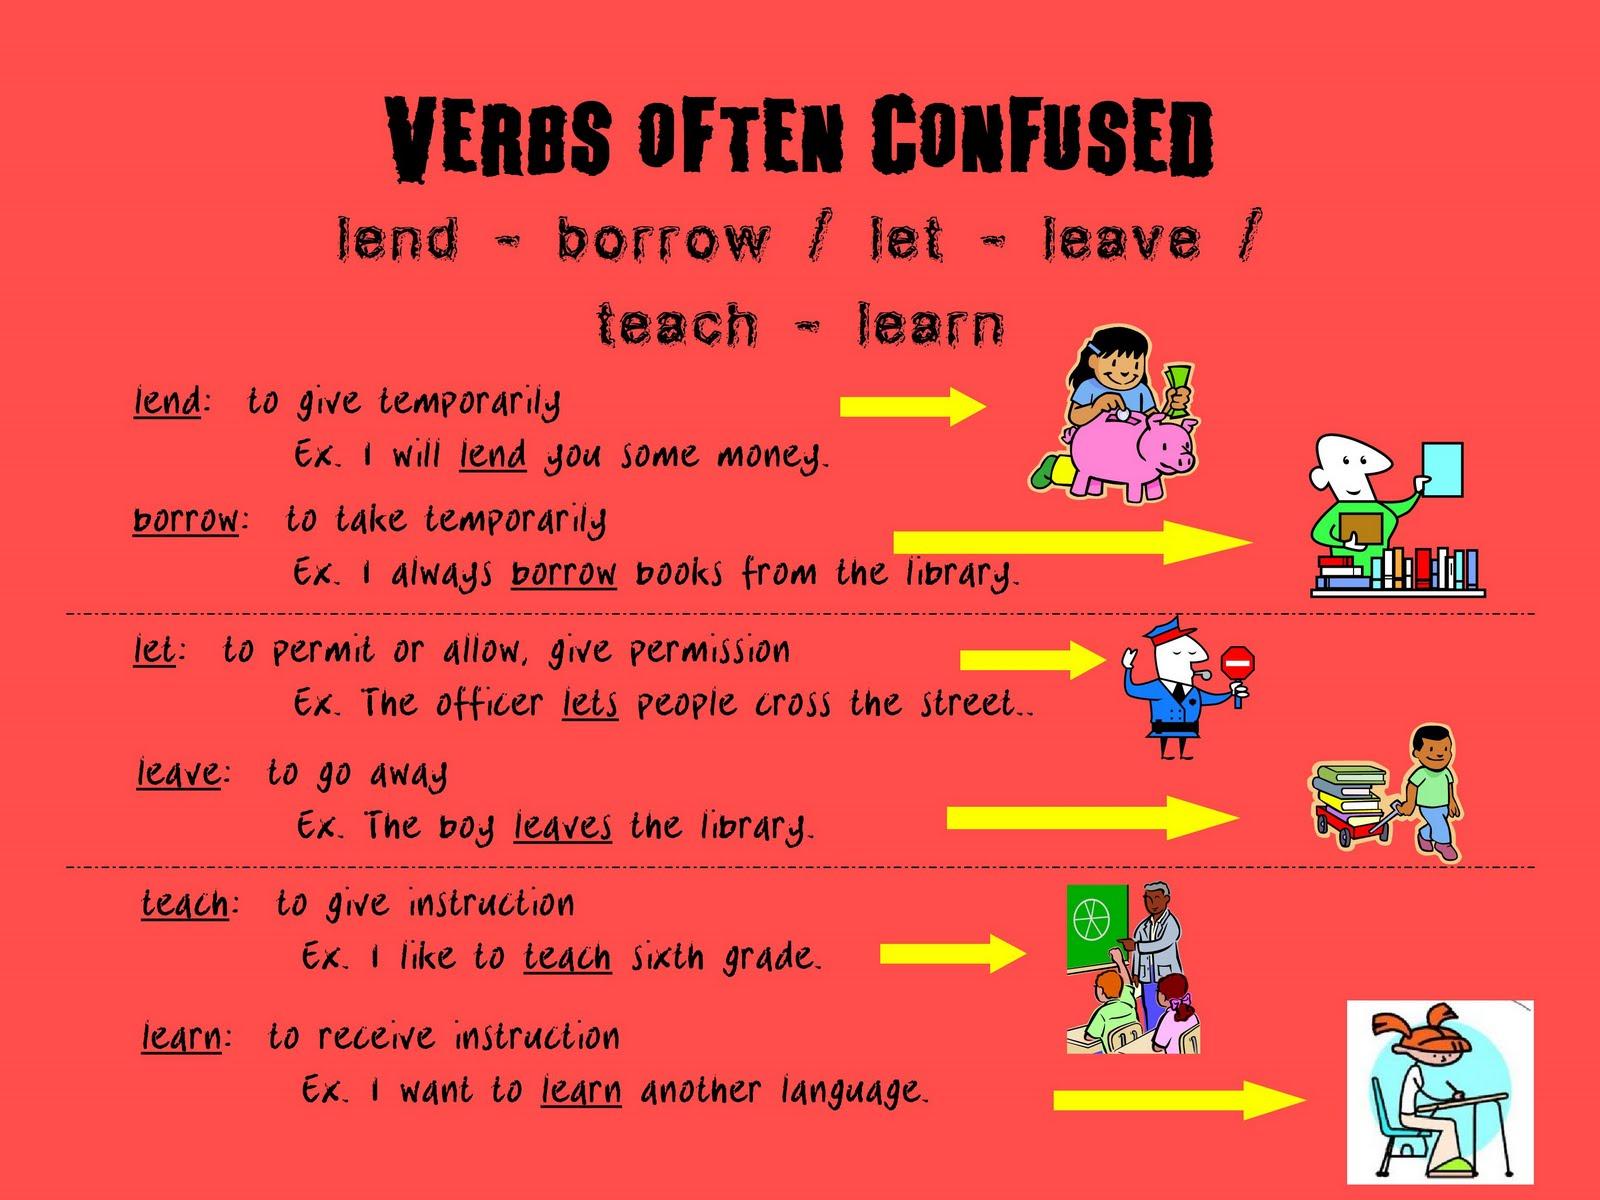 6th Grade Verbs Often Confused